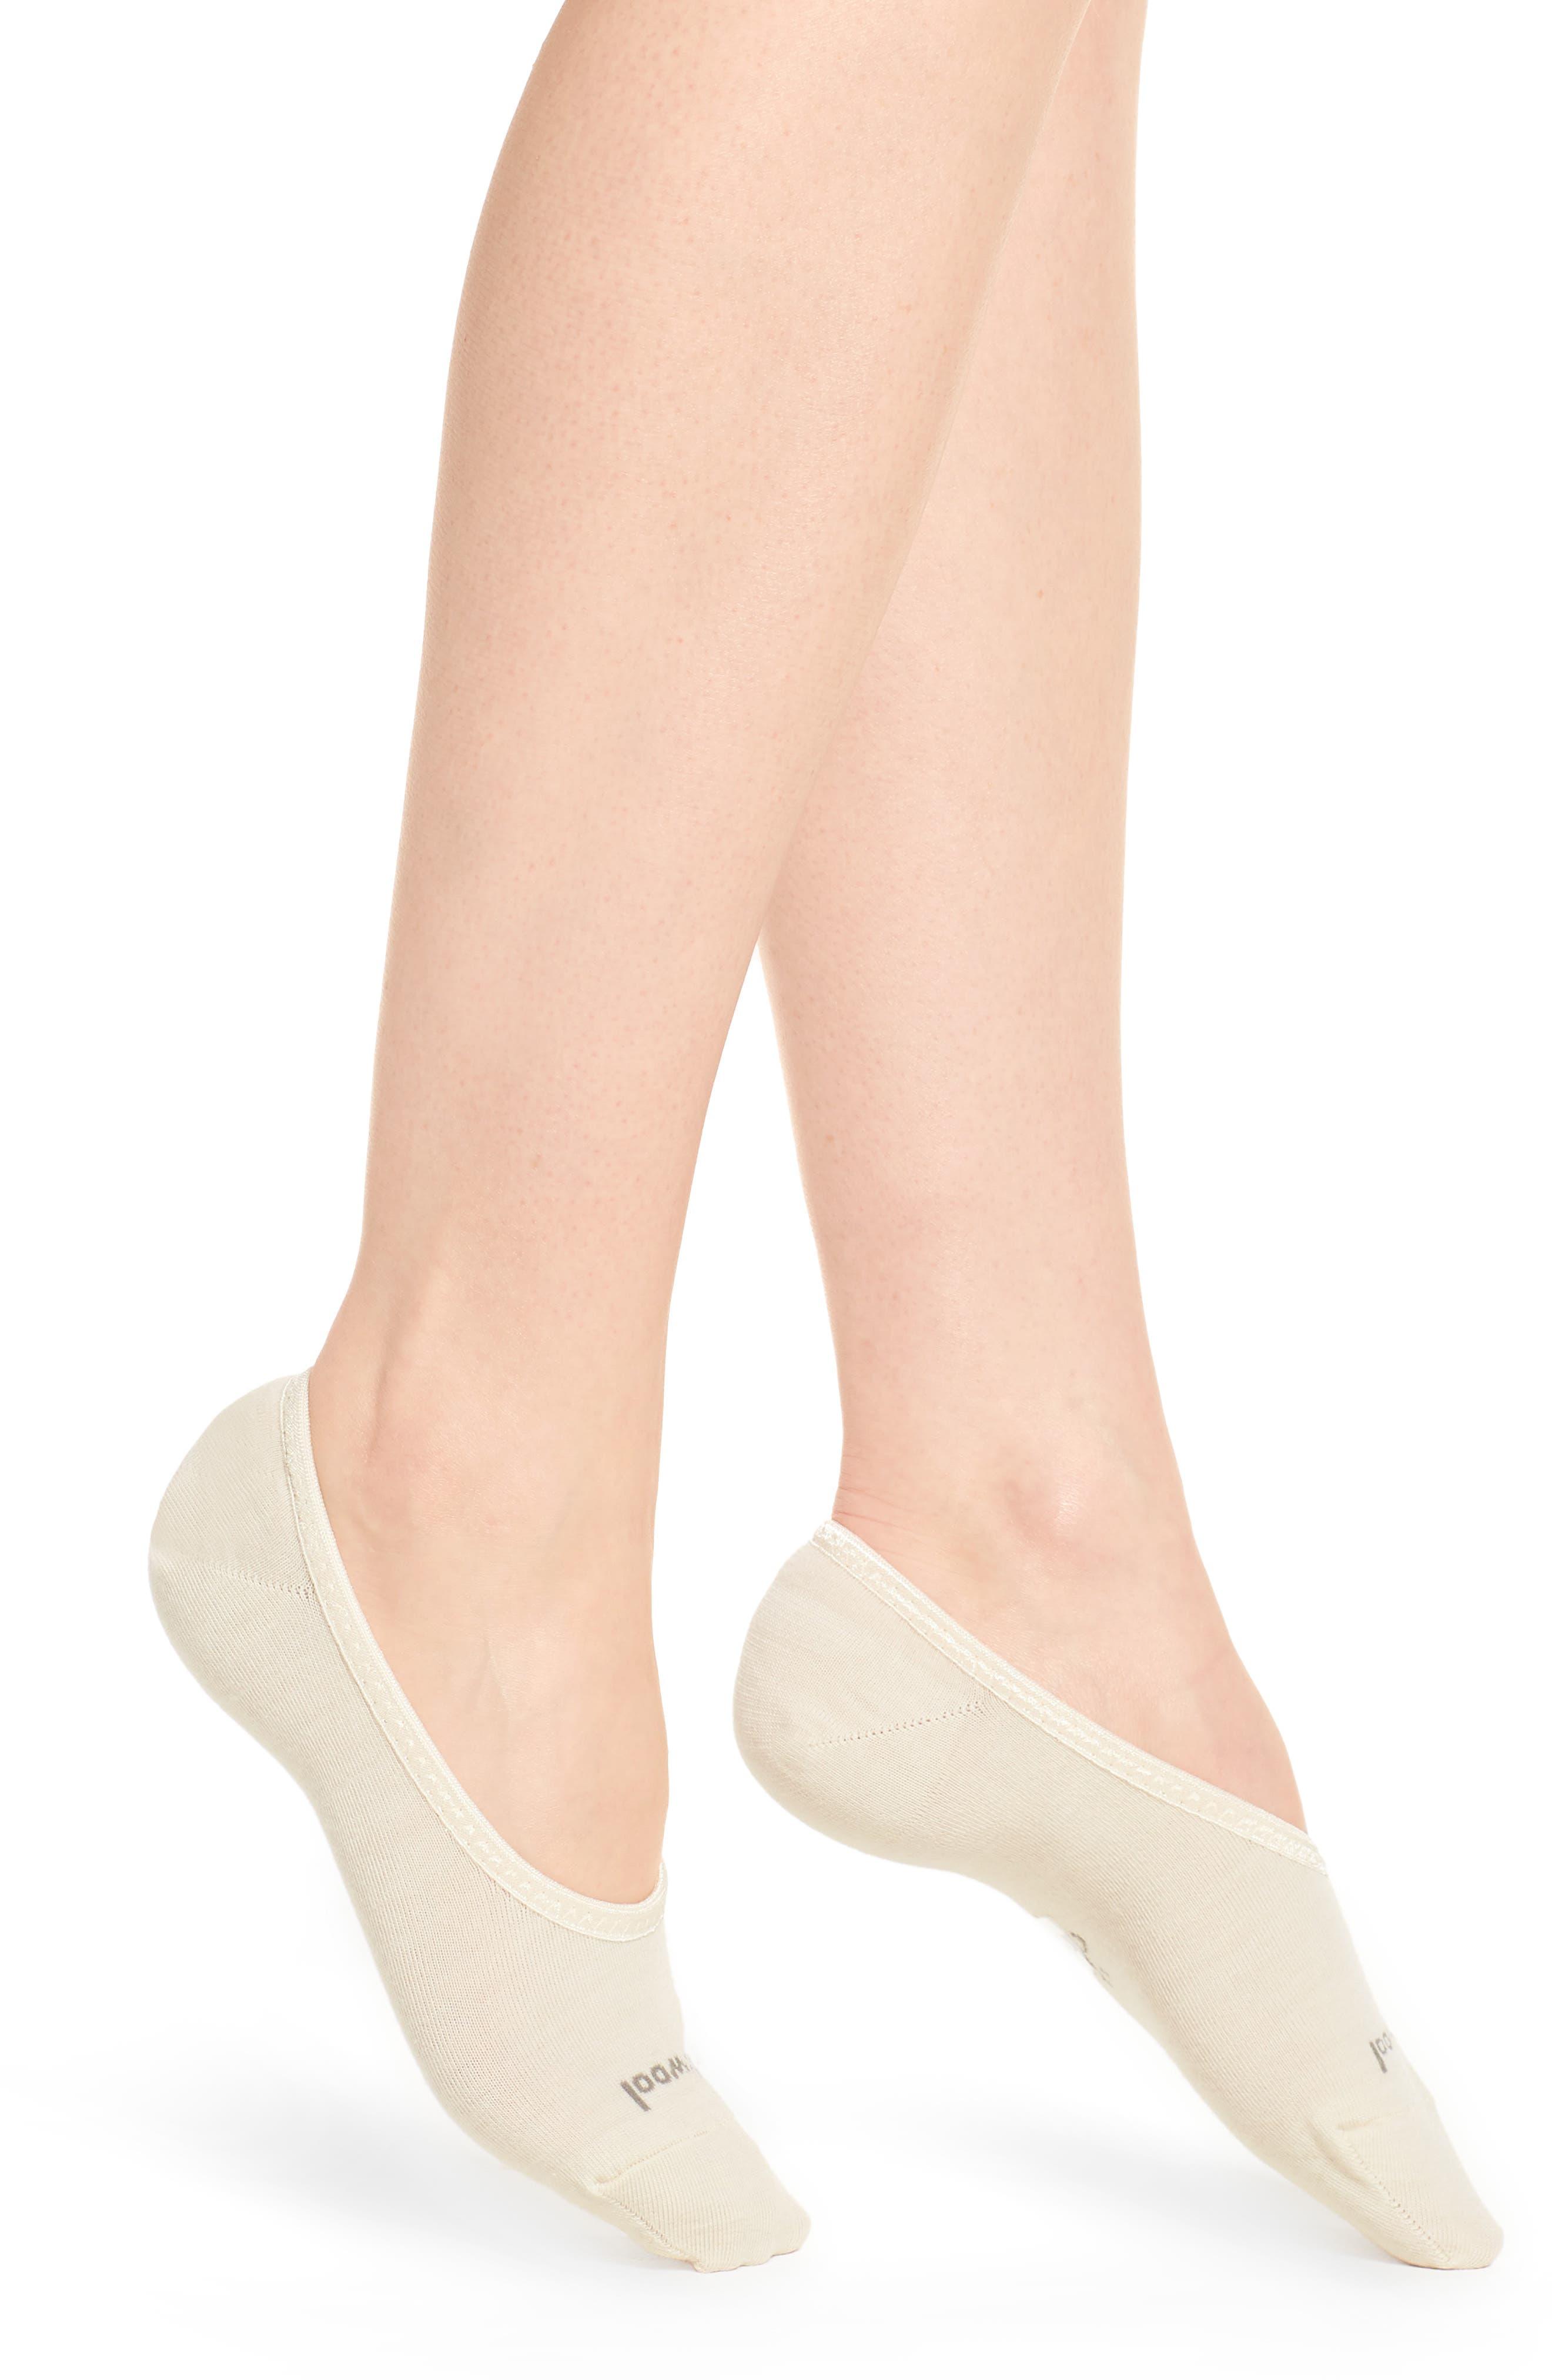 SMARTWOOL 'Hide and Seek' No-Show Socks, Main, color, 104